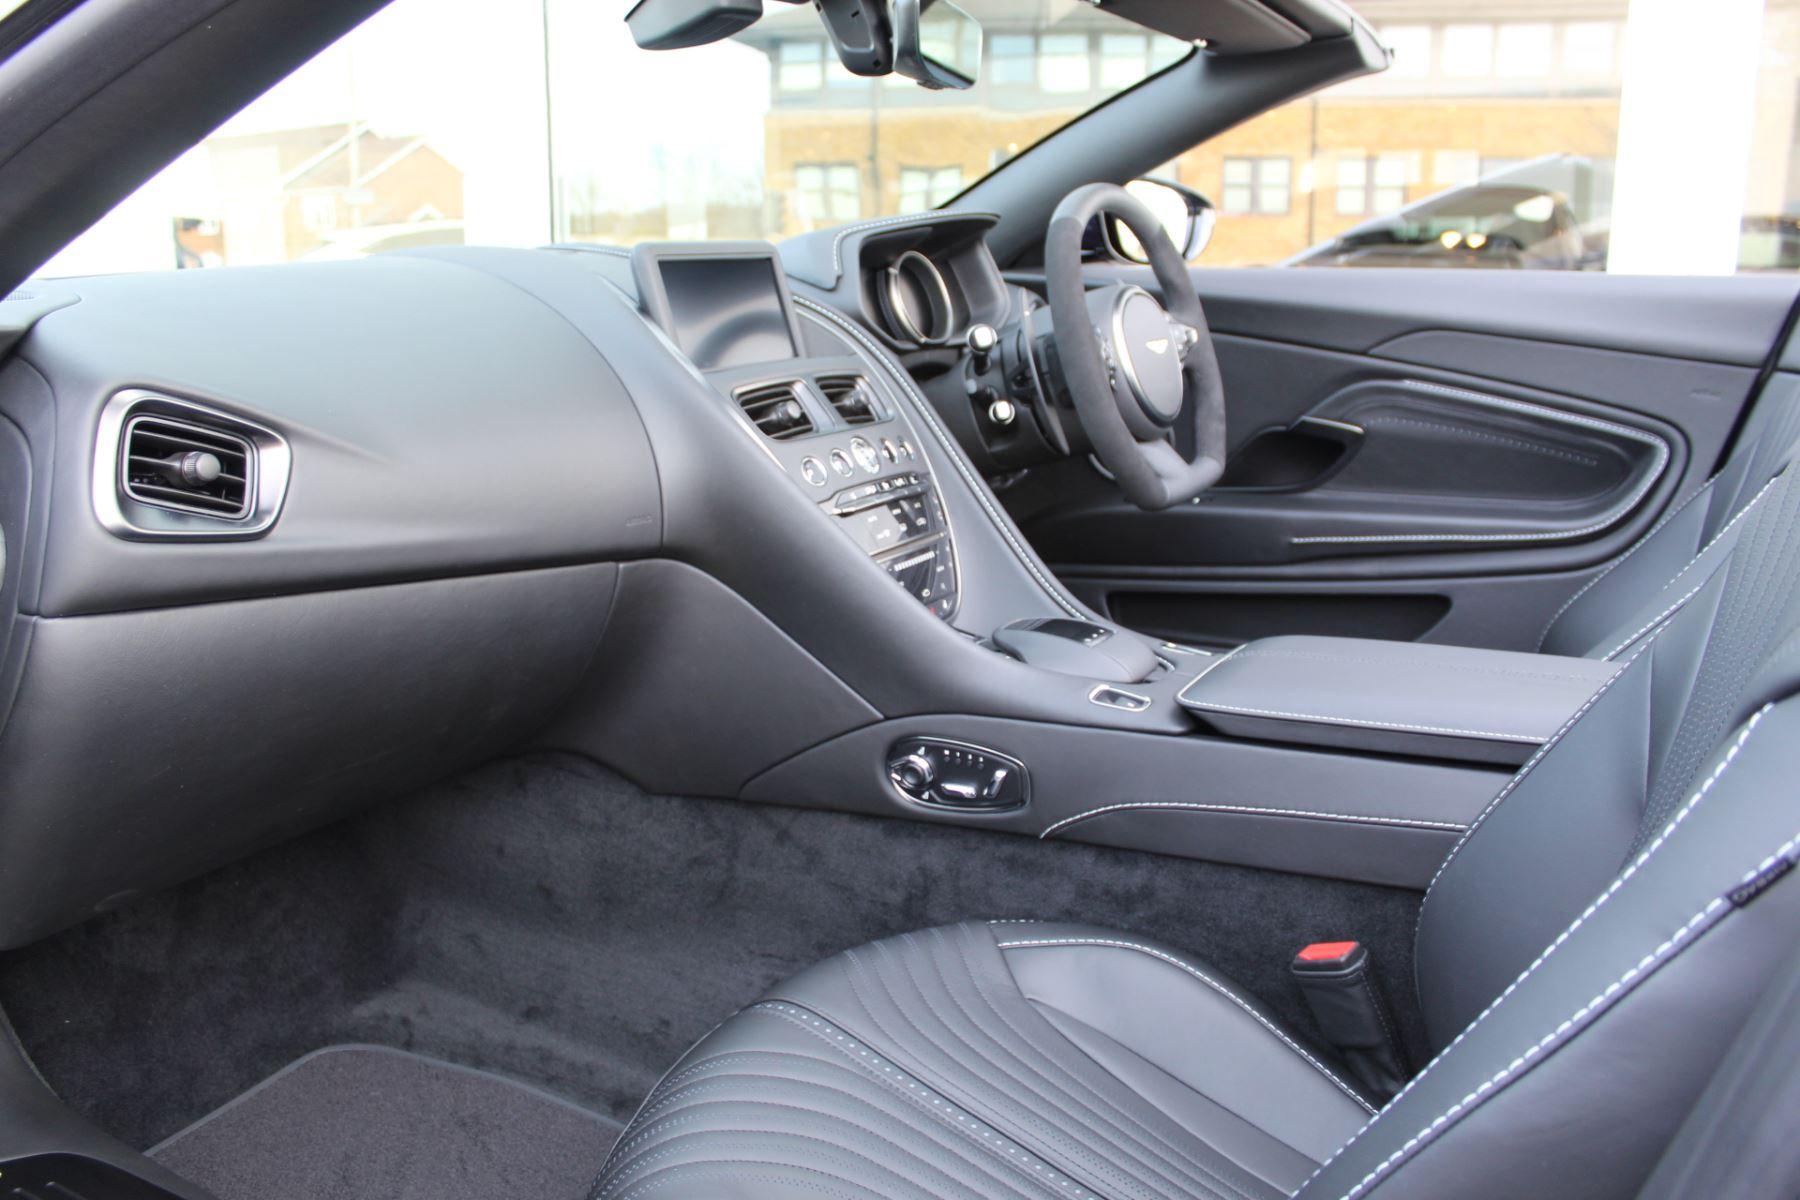 Aston Martin DB11 Volante V8 Volante 2dr Touchtronic image 3